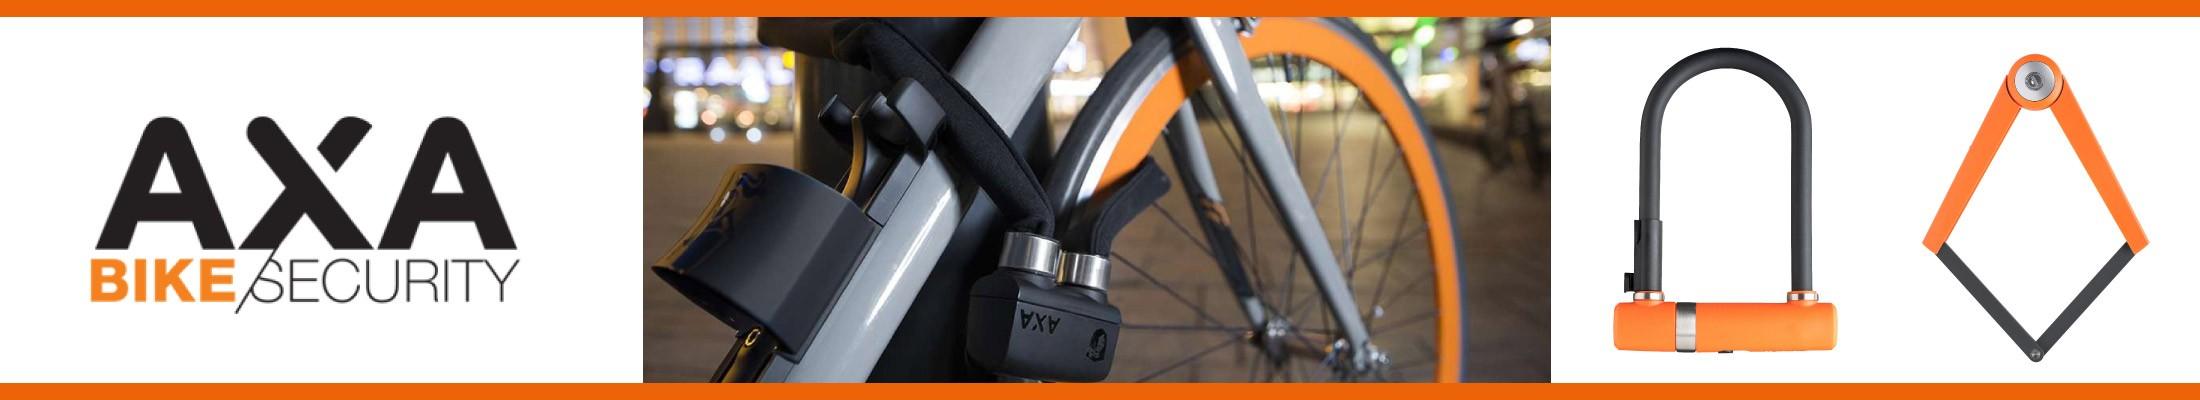 Découvrez l'ensemble de nos antivols Axa, Luma sur Bike Original.com